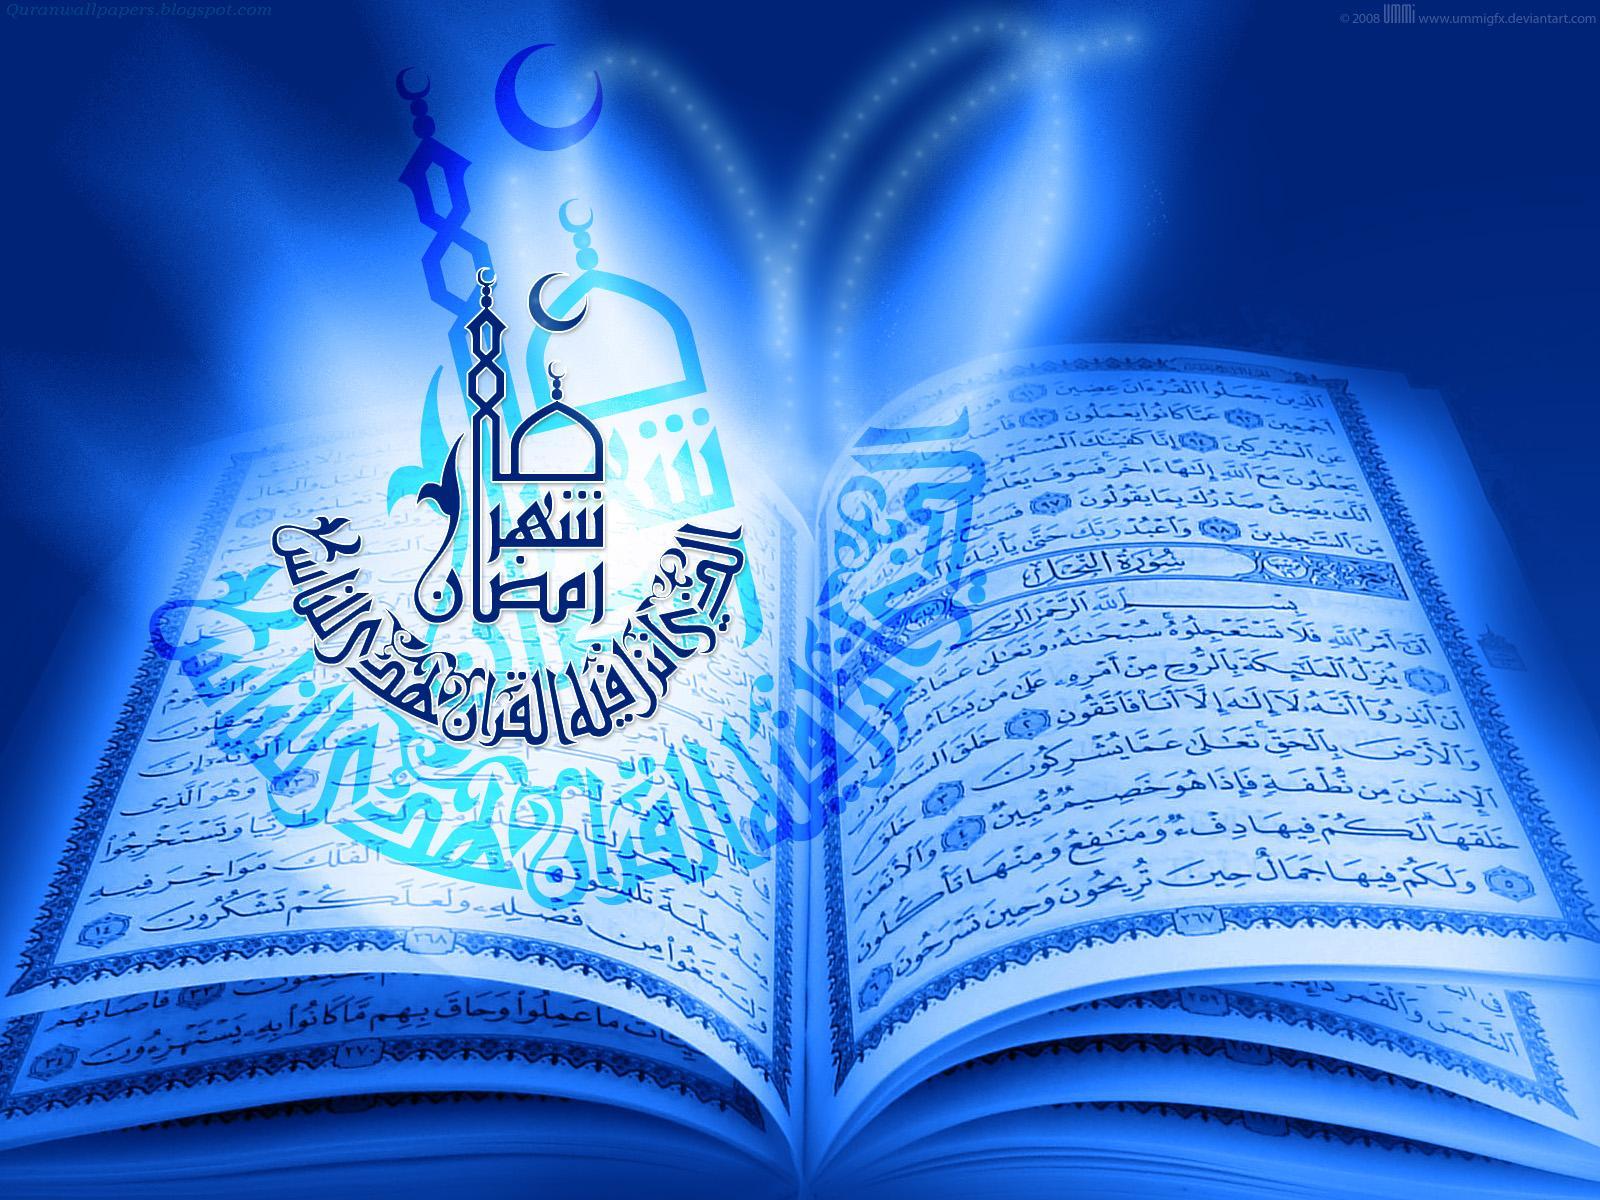 http://1.bp.blogspot.com/-pz6SrMMWdI4/UBzmxJmEQ_I/AAAAAAAAACs/Qk8EOtig2XU/s1600/Salaam_Ramadan_ISLAM_QURAN_WALLPAPERS_2011.jpg